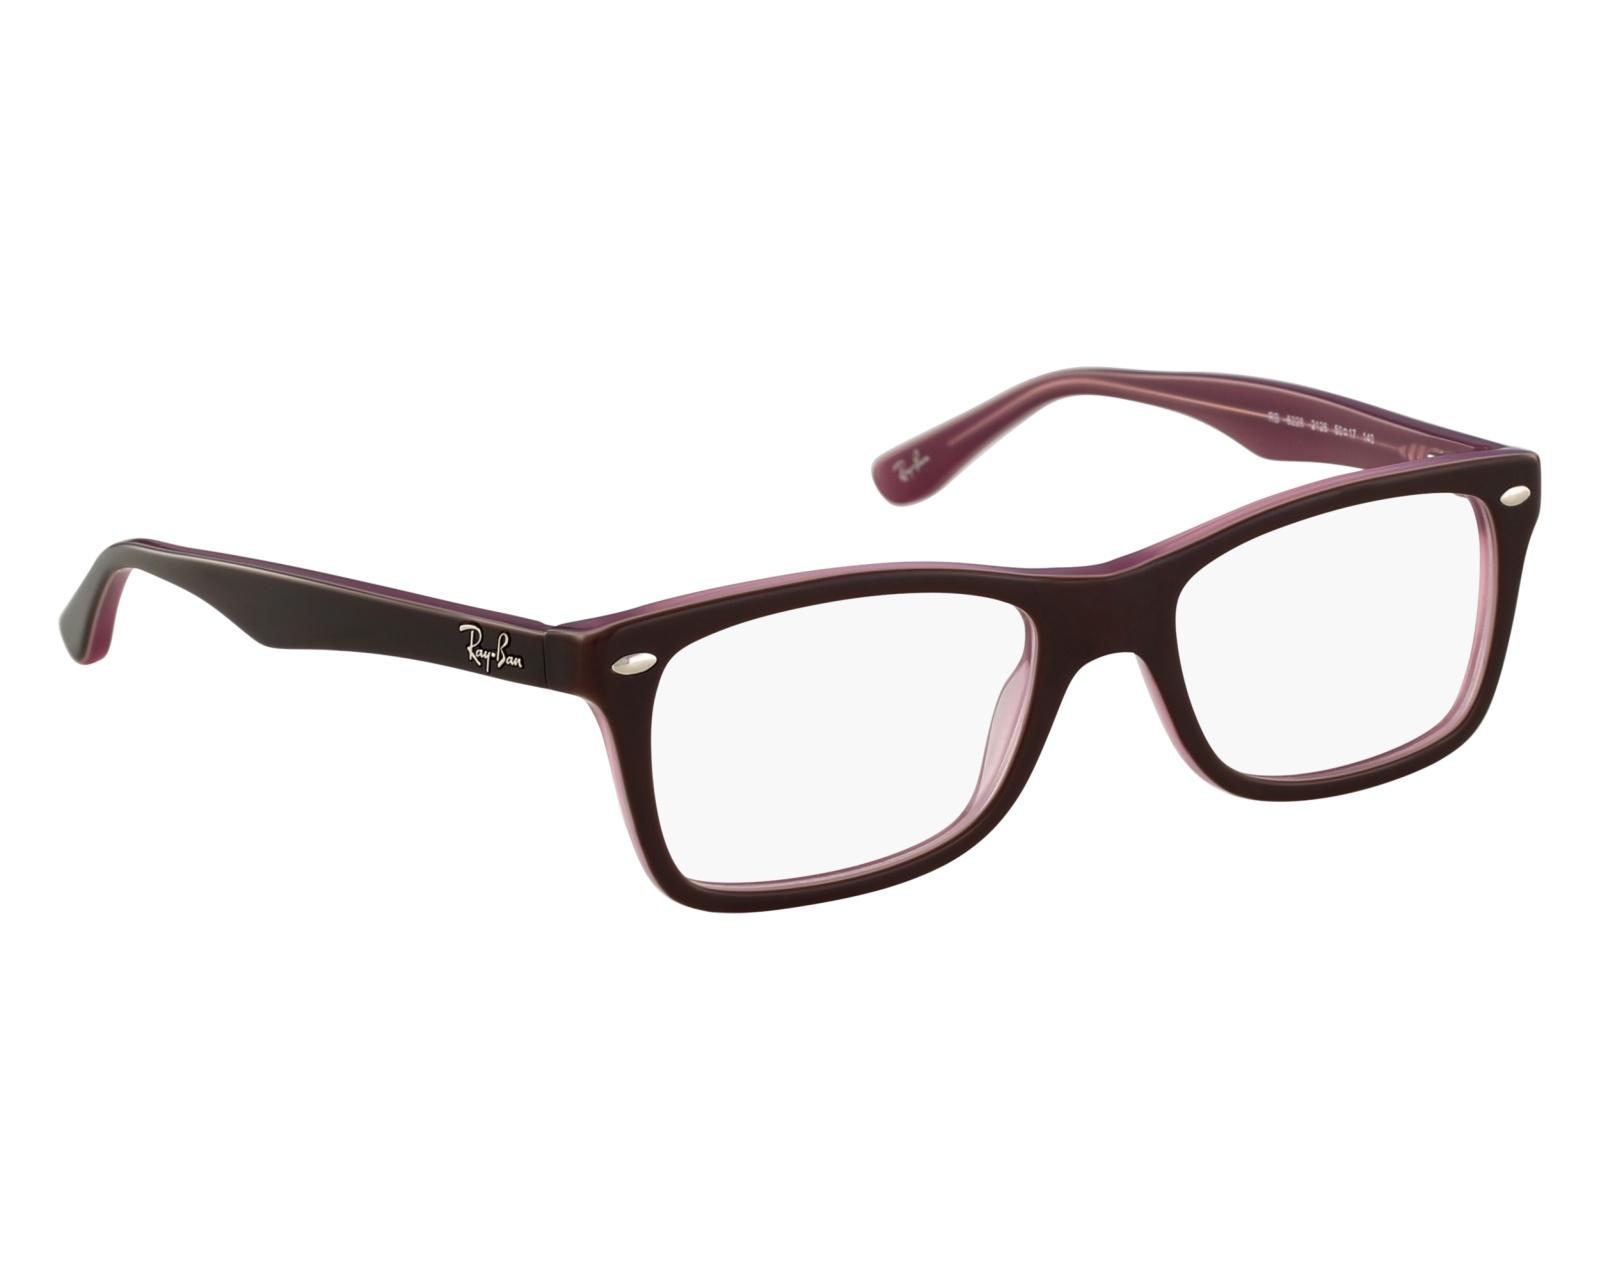 732f21fd8f eyeglasses Ray-Ban RX-5228 2126 50-17 Purple front view